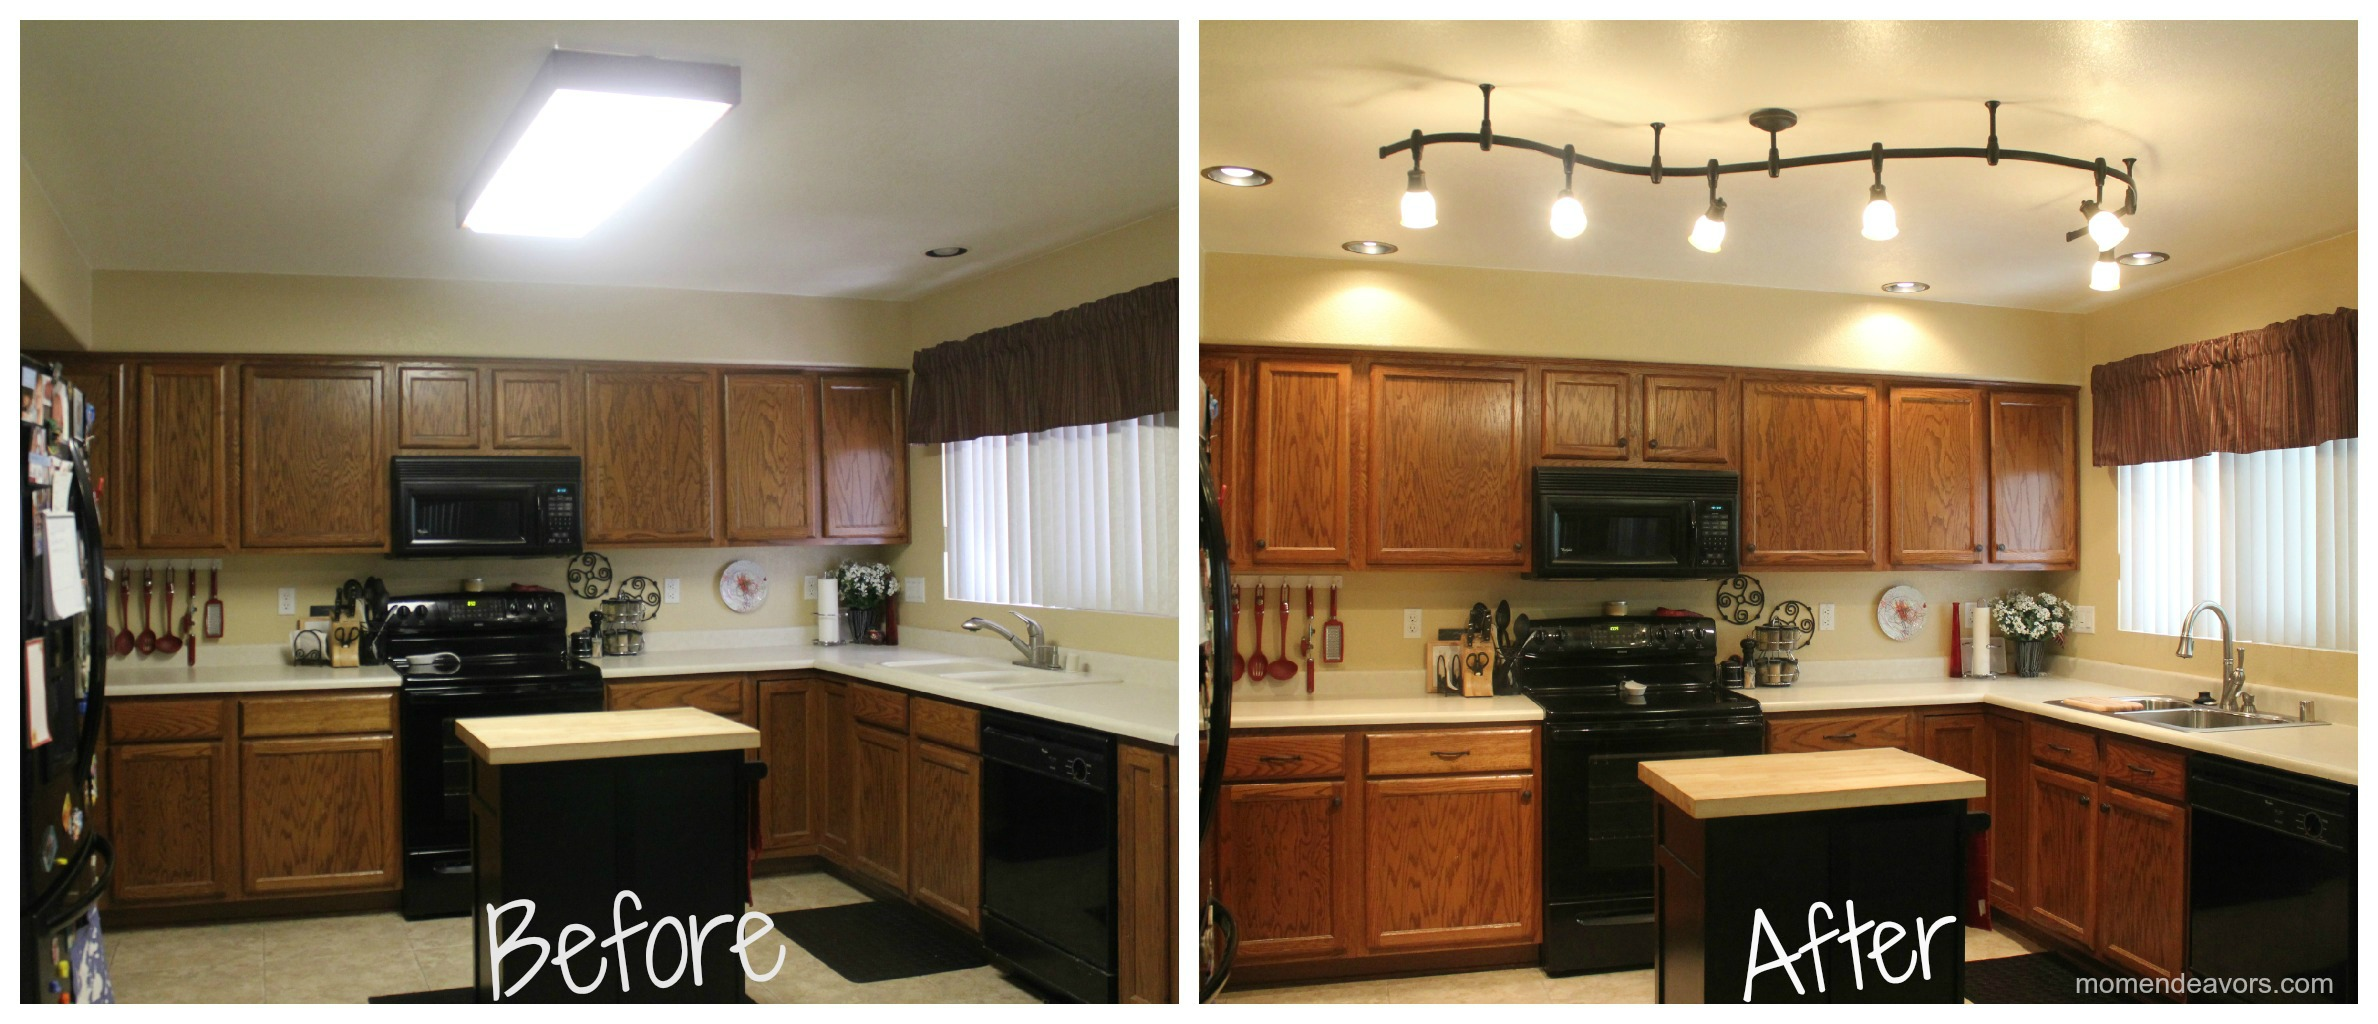 lighting upgrade before and after, beth sterner